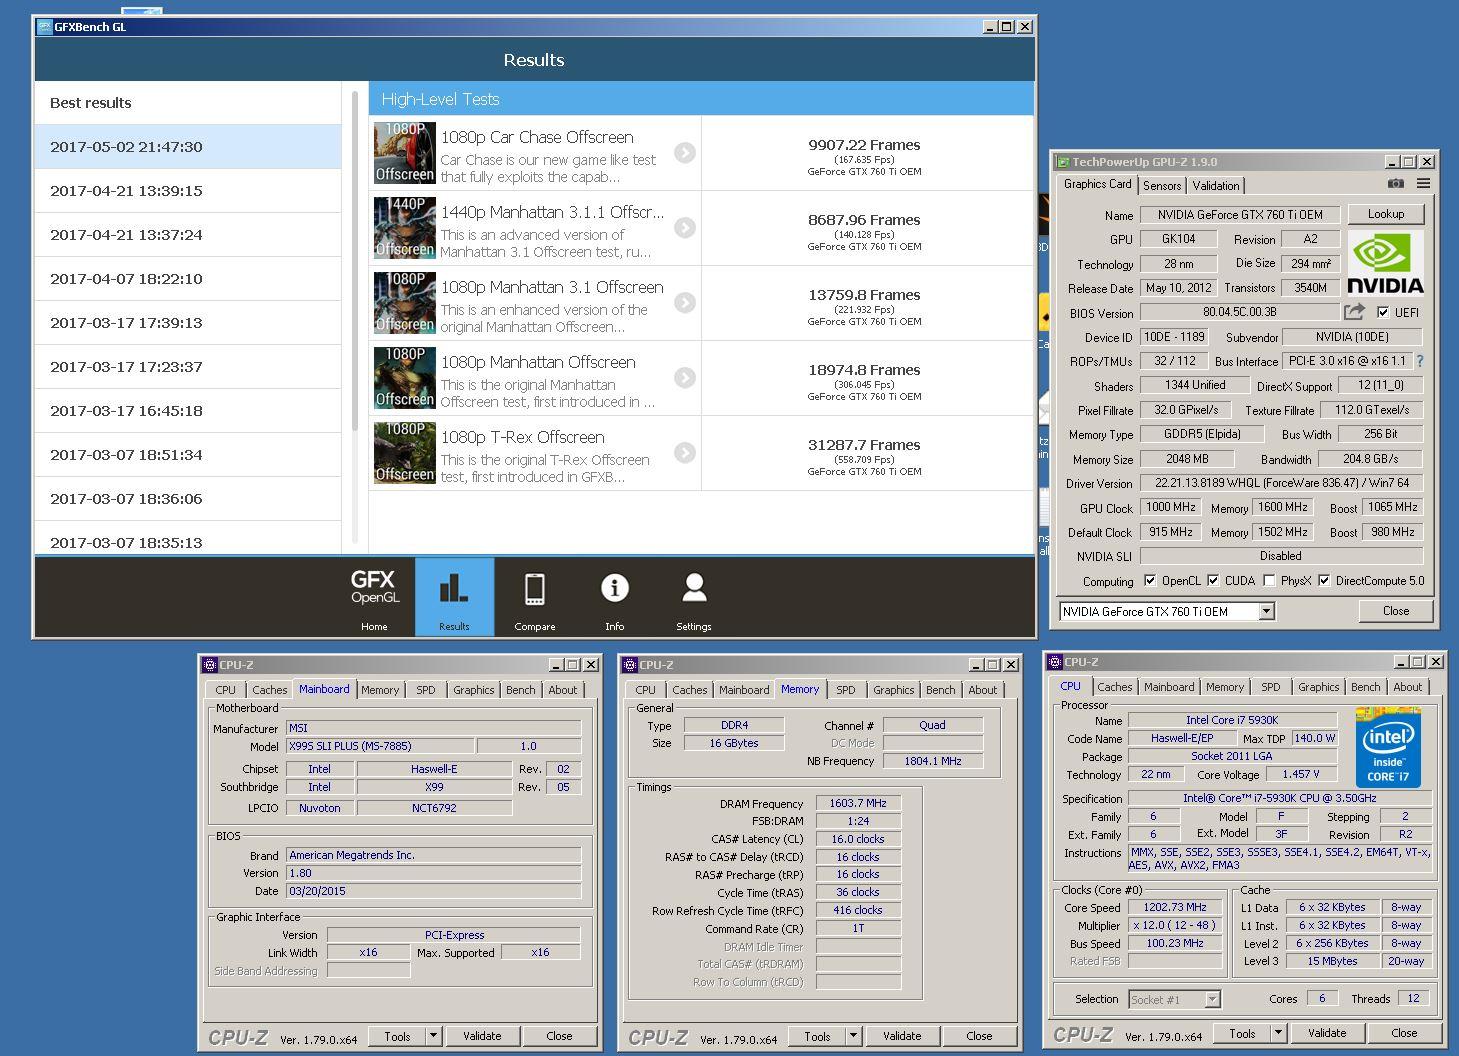 Intelguys Gfxbench 1080p T Rex Offscreen Score 312877 Frames Gtx 760 Ti Media Gallery